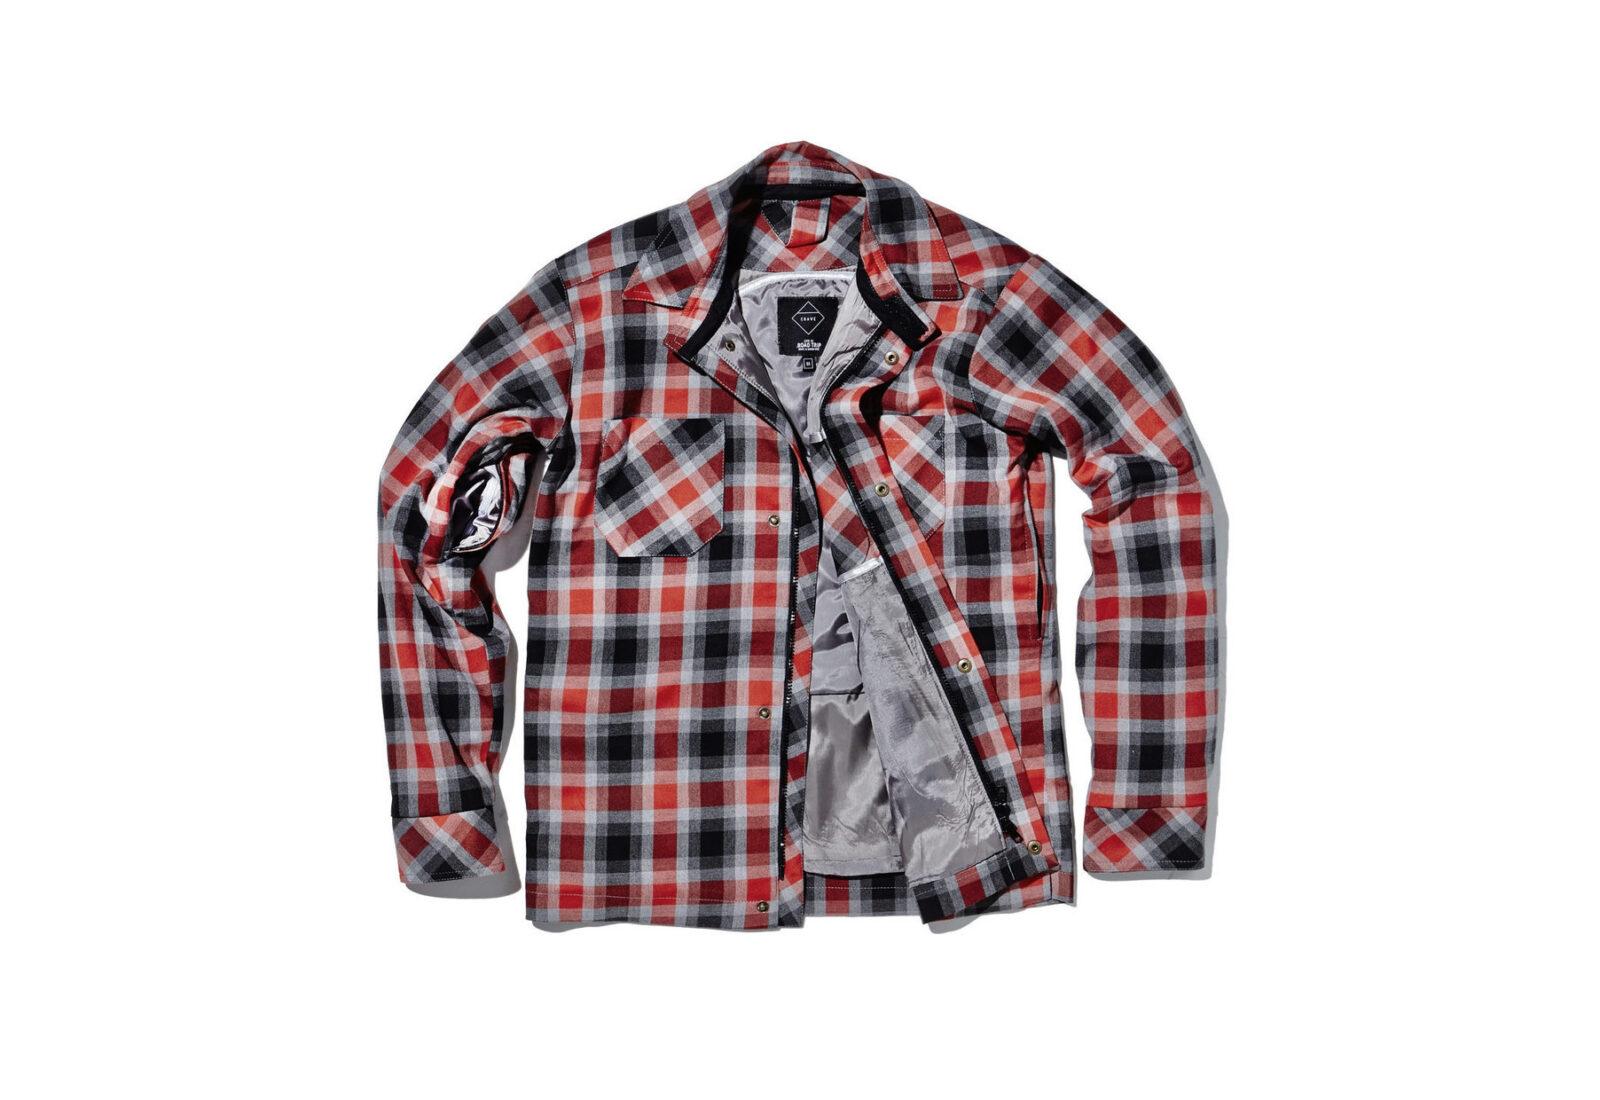 AXE 2 Motorcycle Shirt 1600x1100 - AXE 2 Kevlar Motorcycle Shirt